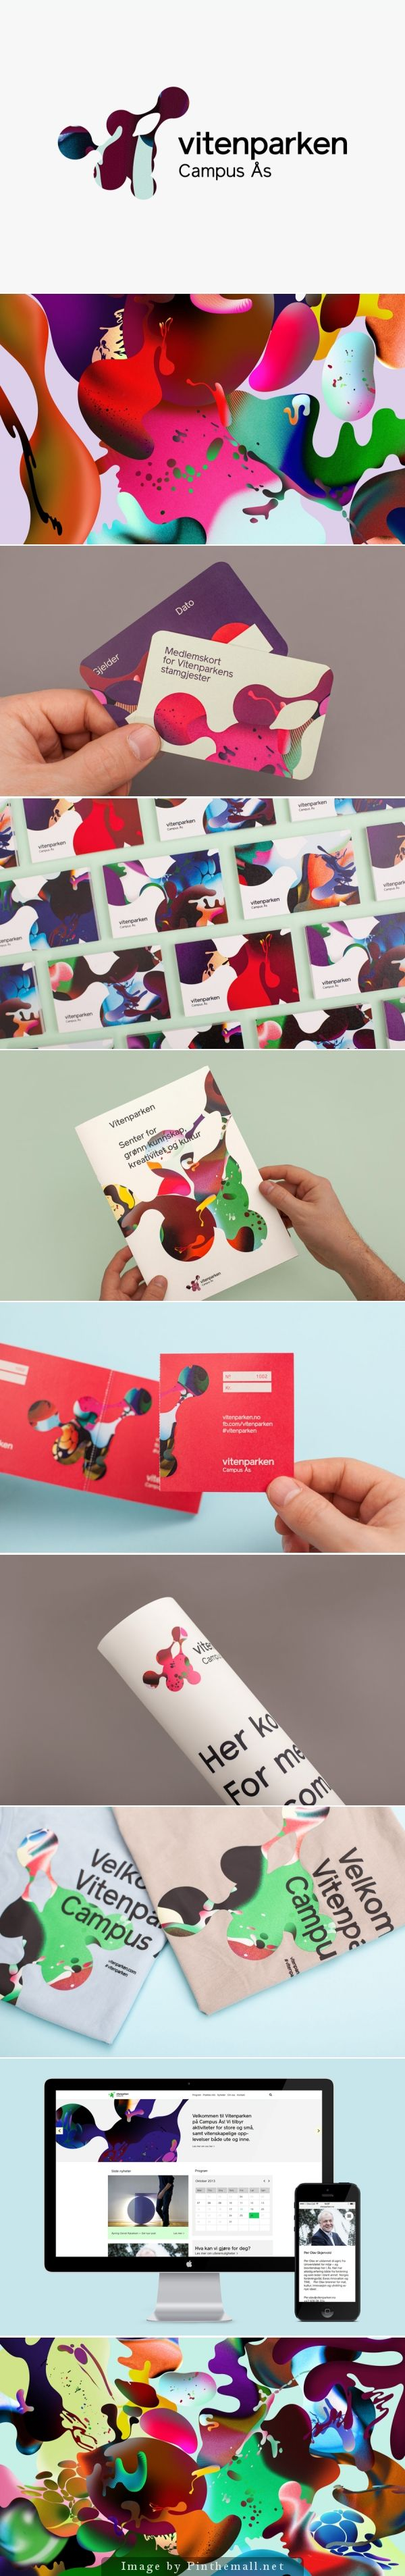 Vitenparken designed by Bielke+Yang http://bpando.org/2014/04/14/brand-identity-vitenparken/